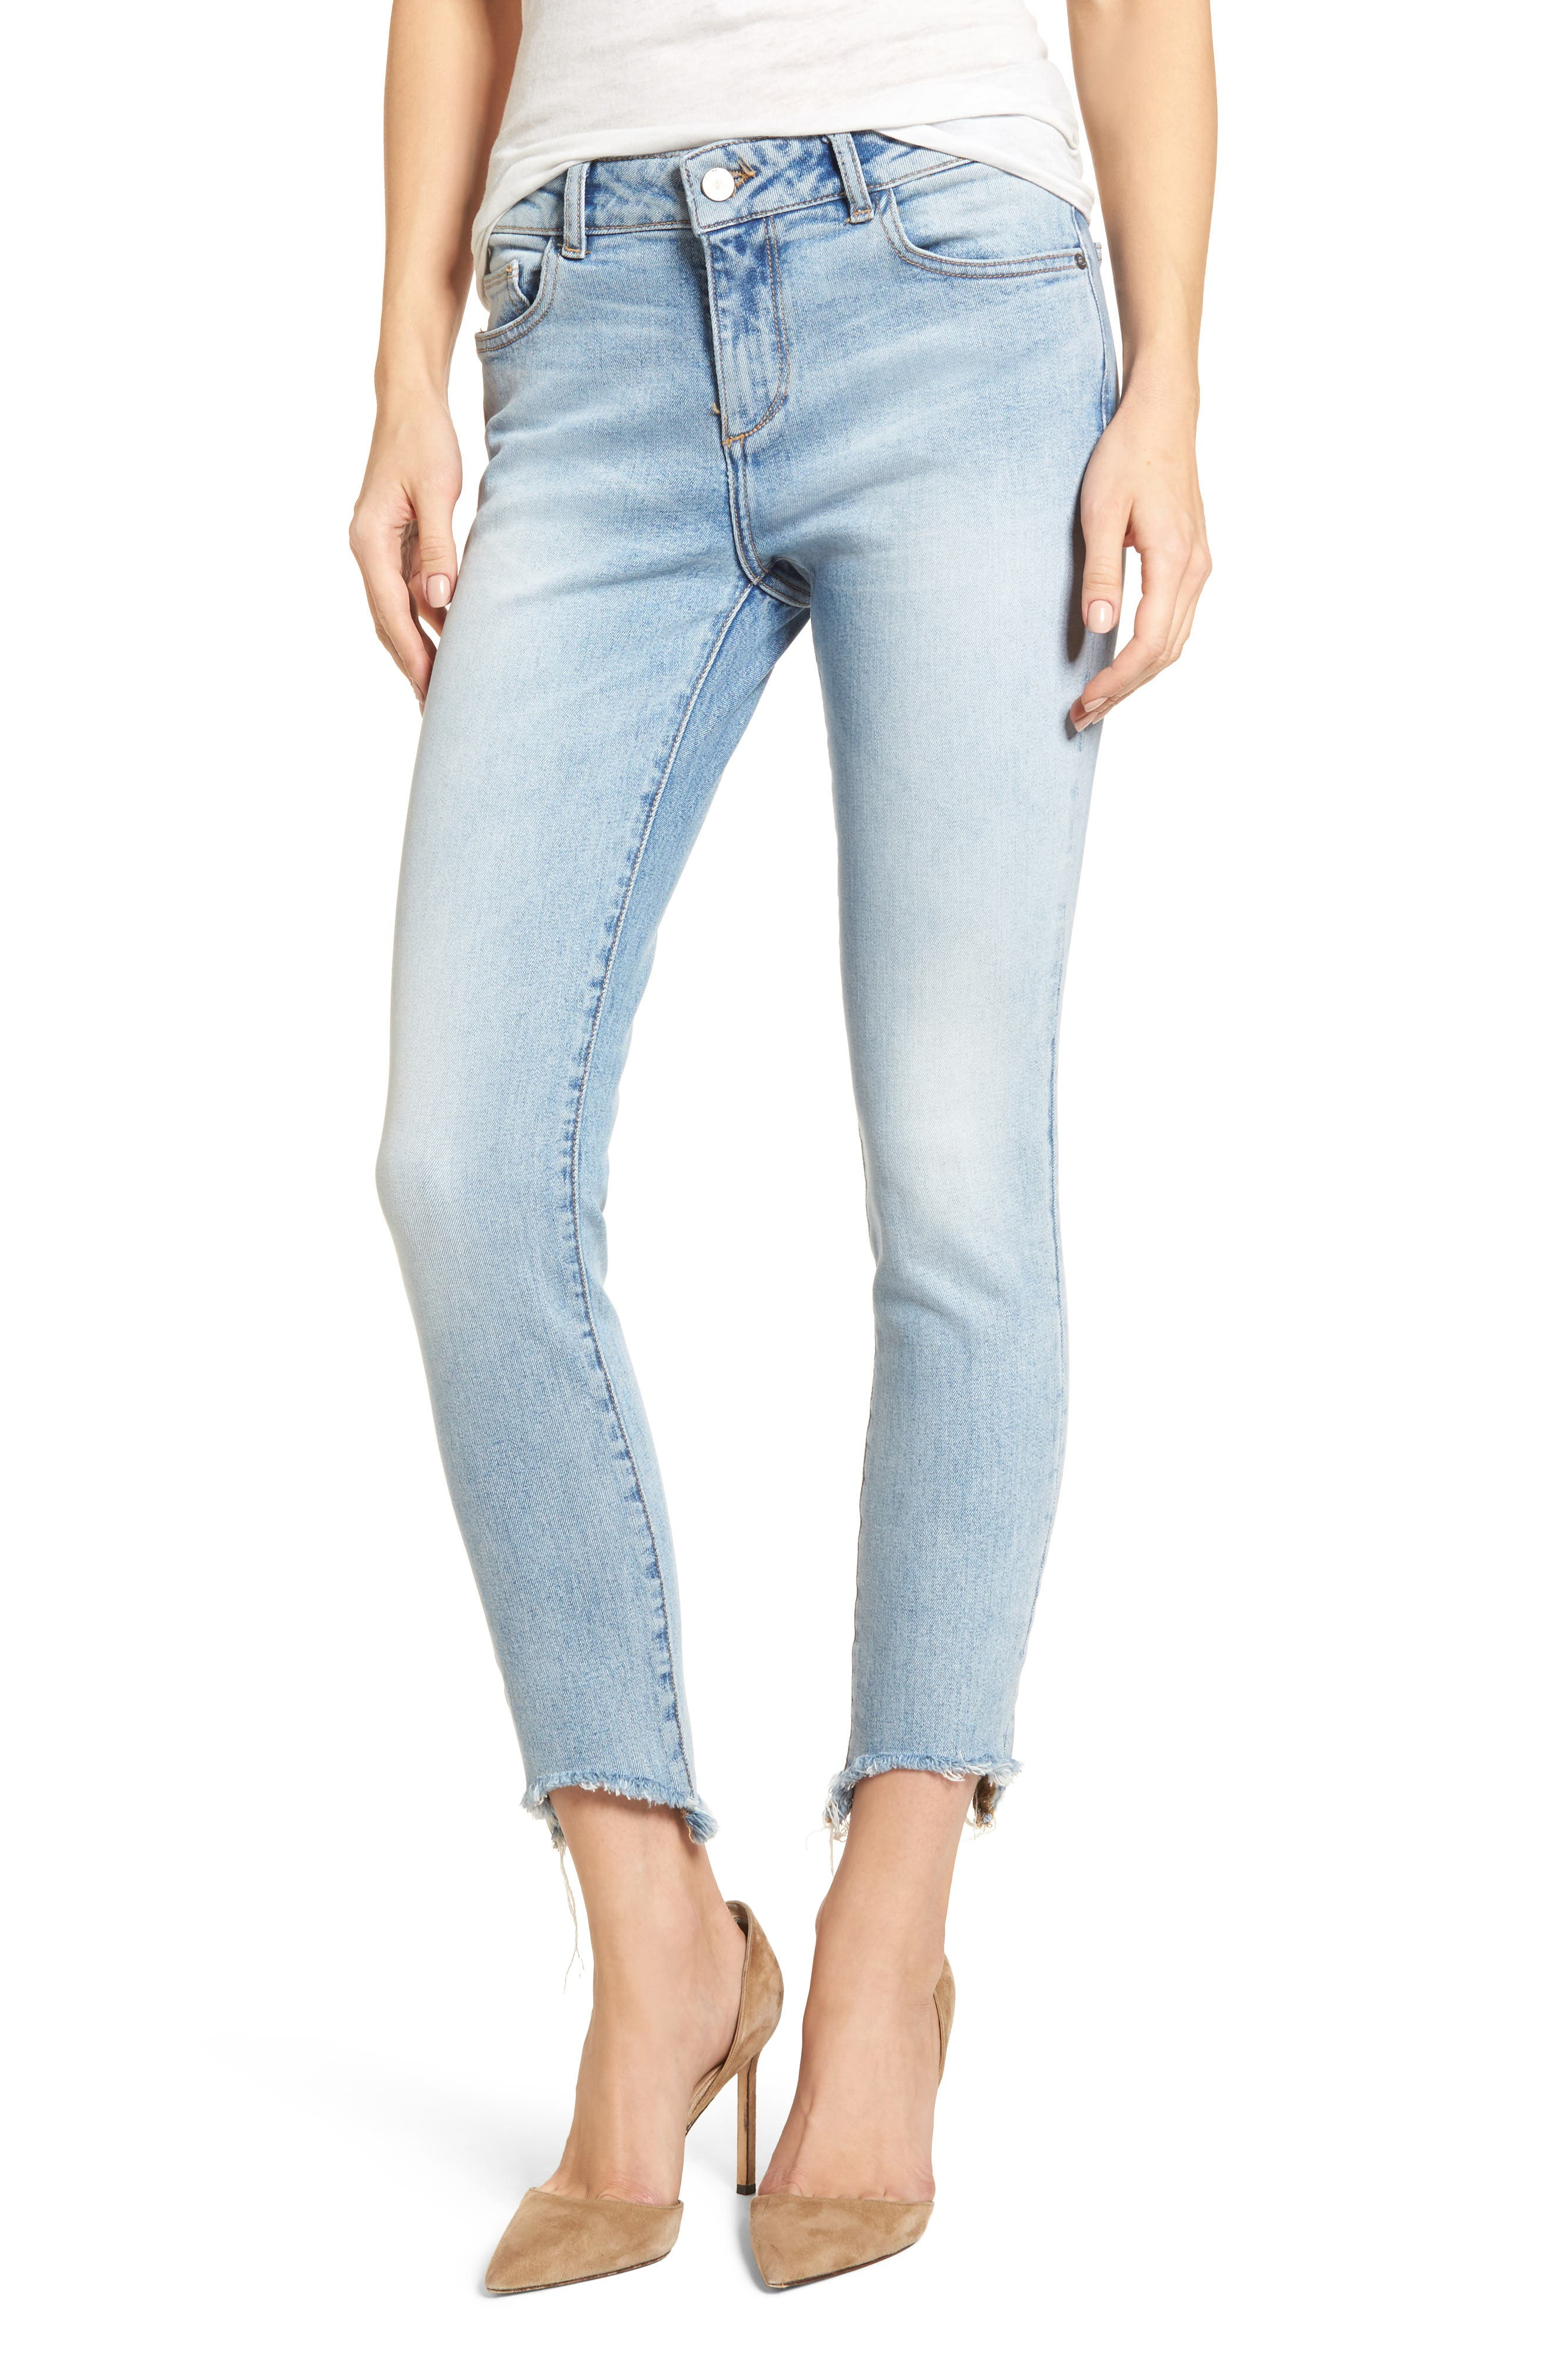 Main Image - DL1961 Margaux Instasculpt Ankle Skinny Jeans (Promenade)